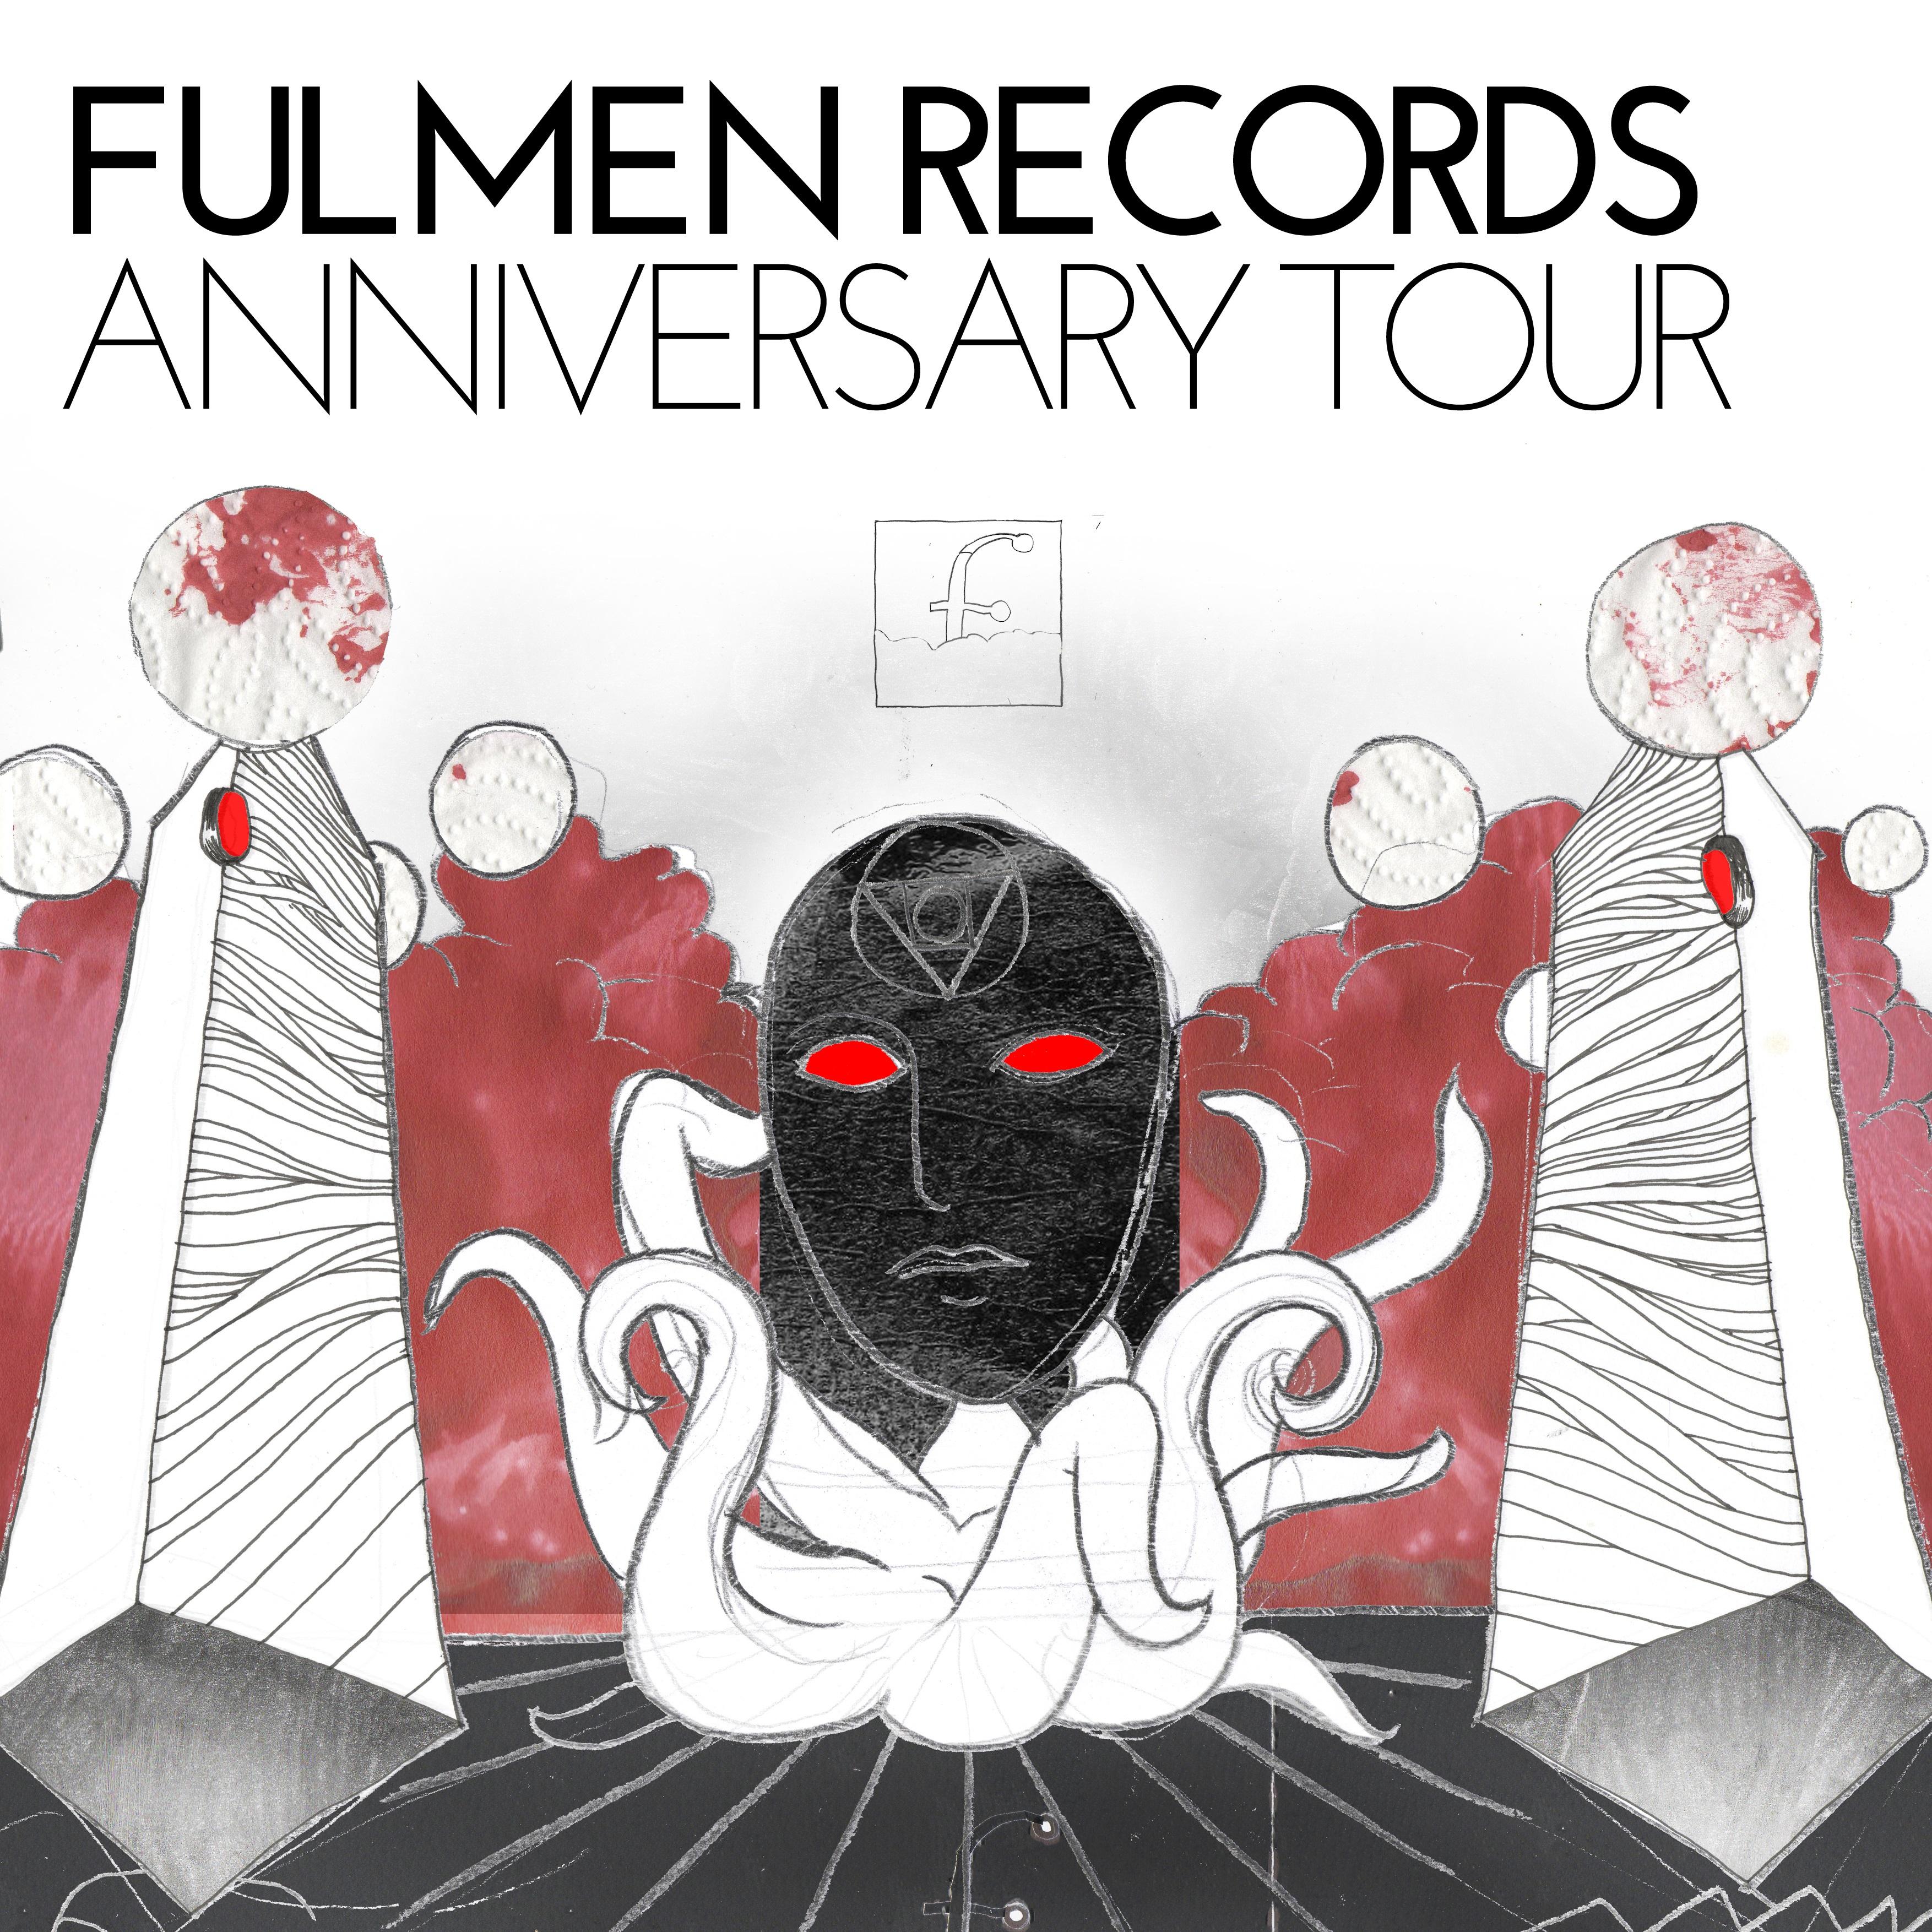 Fulmen Anniversary 14.11.16